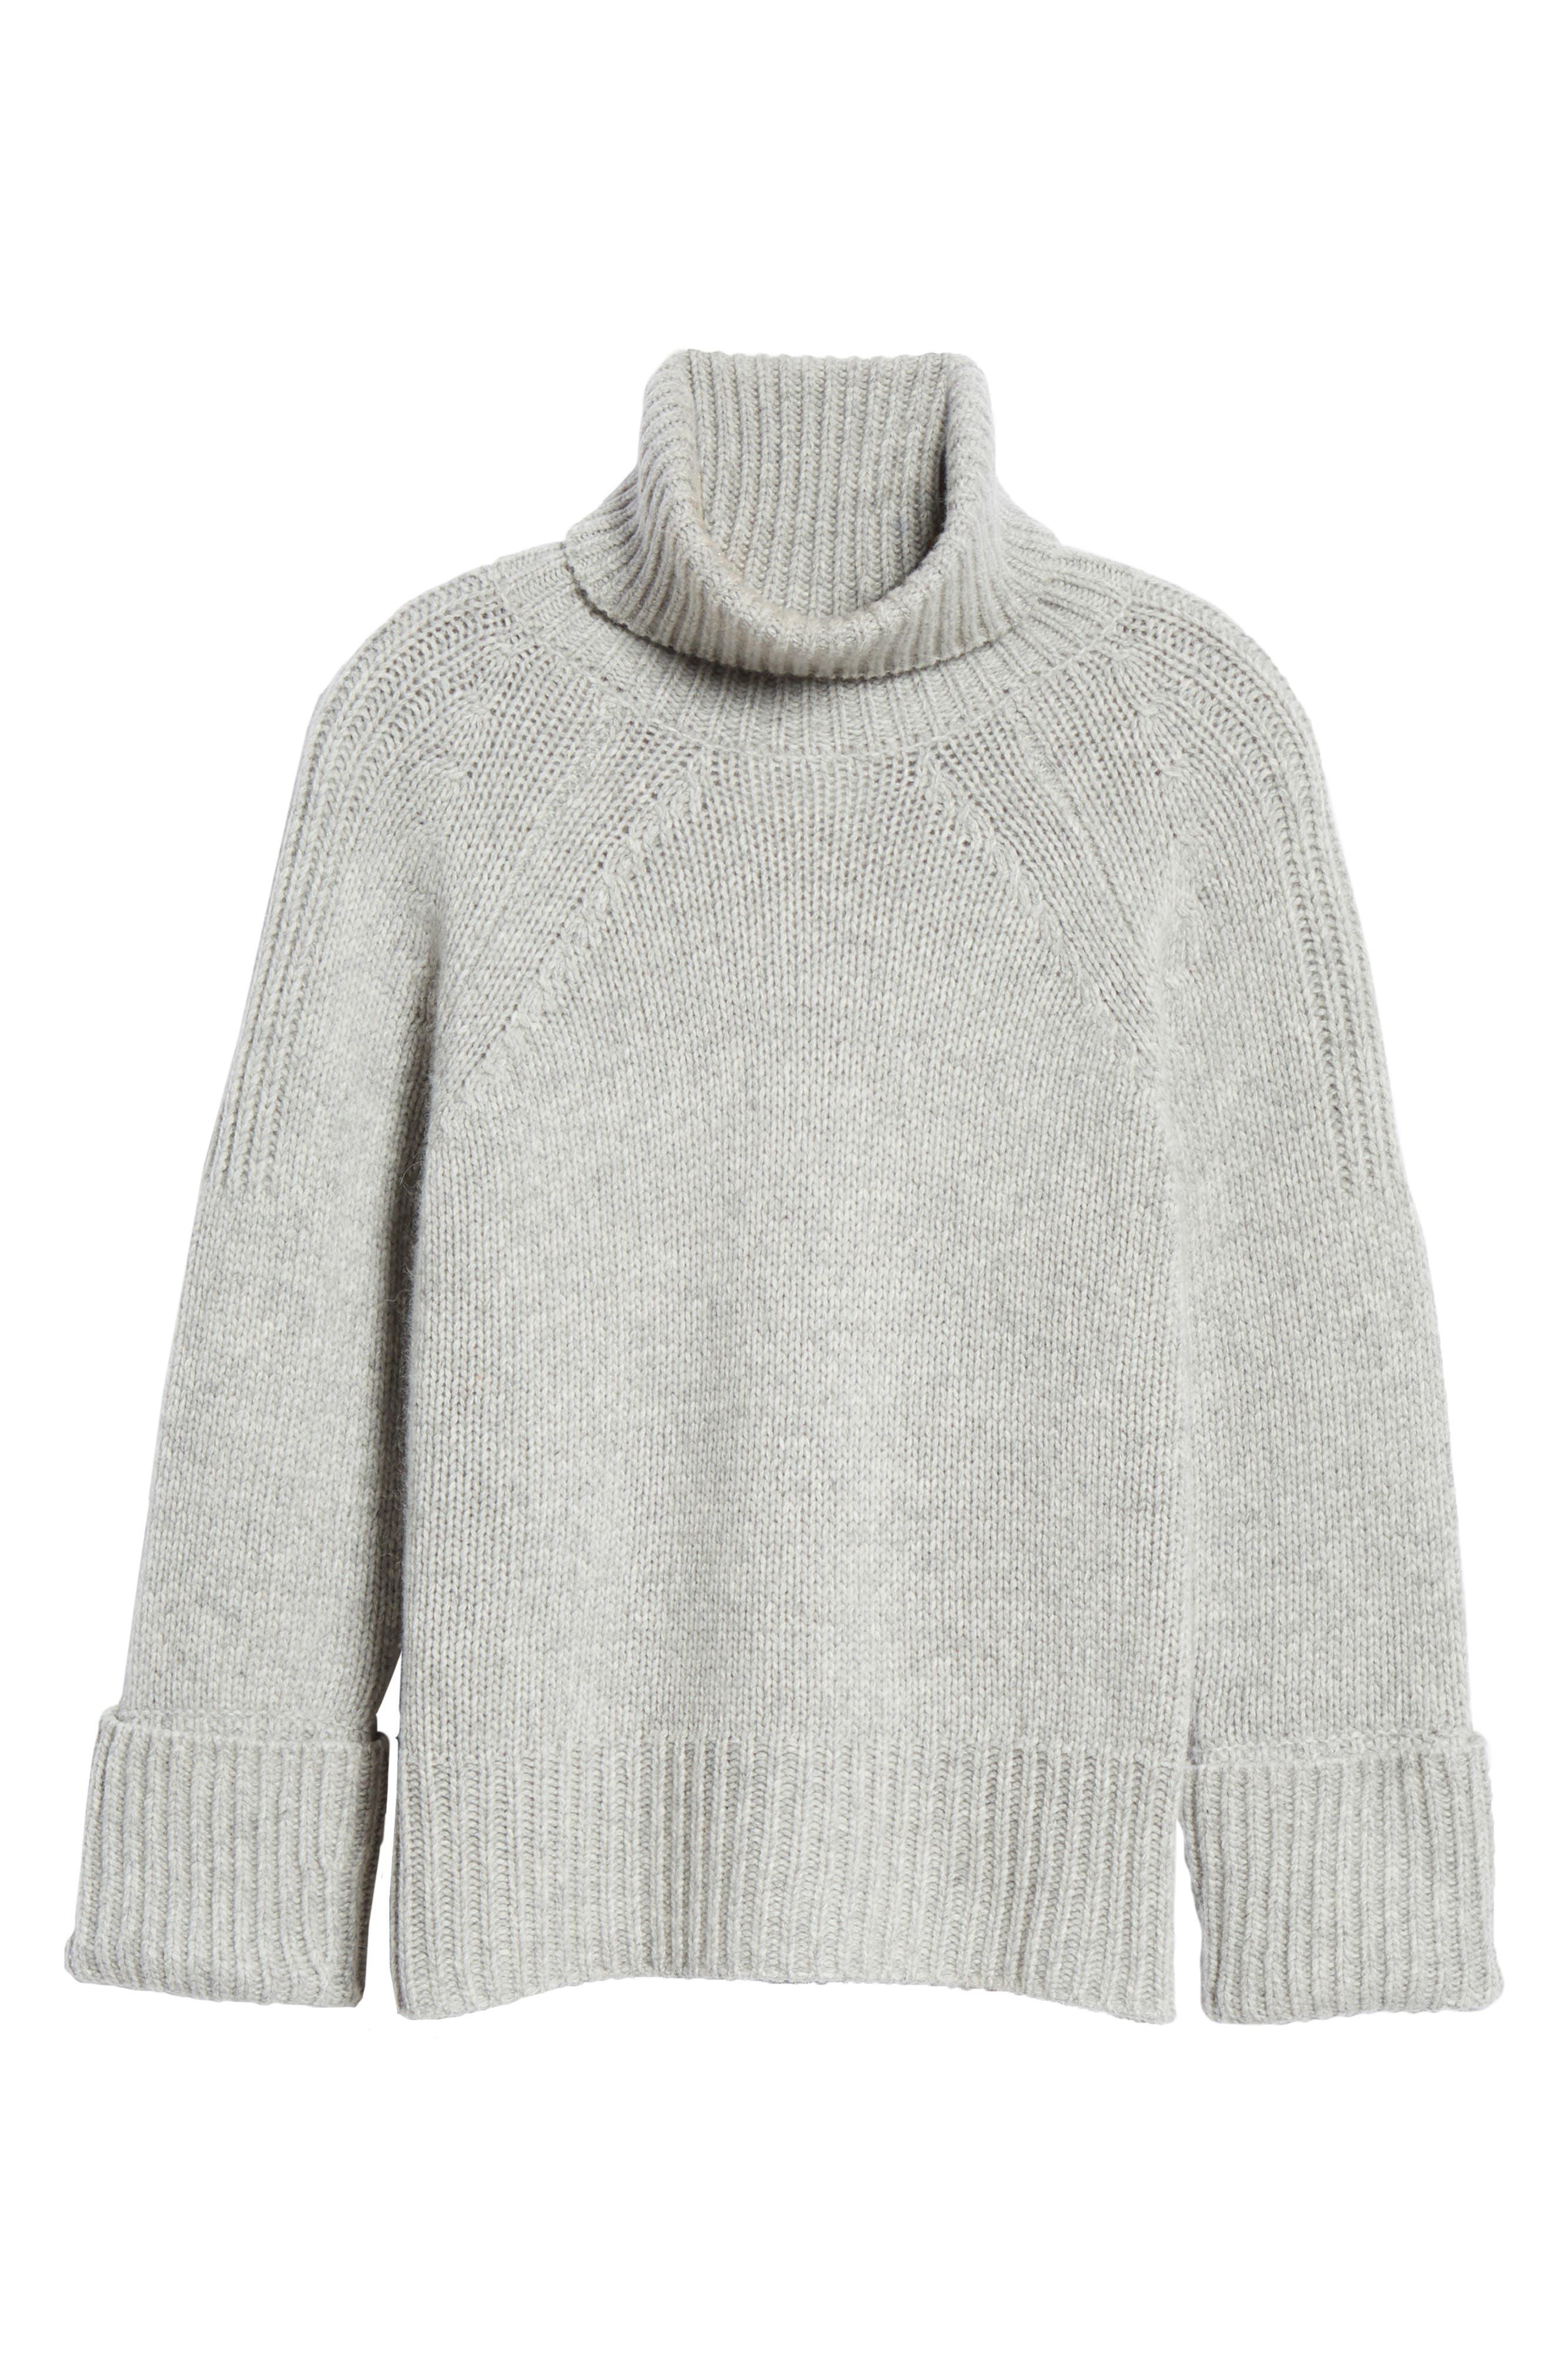 Nagora Sweater,                             Alternate thumbnail 6, color,                             020